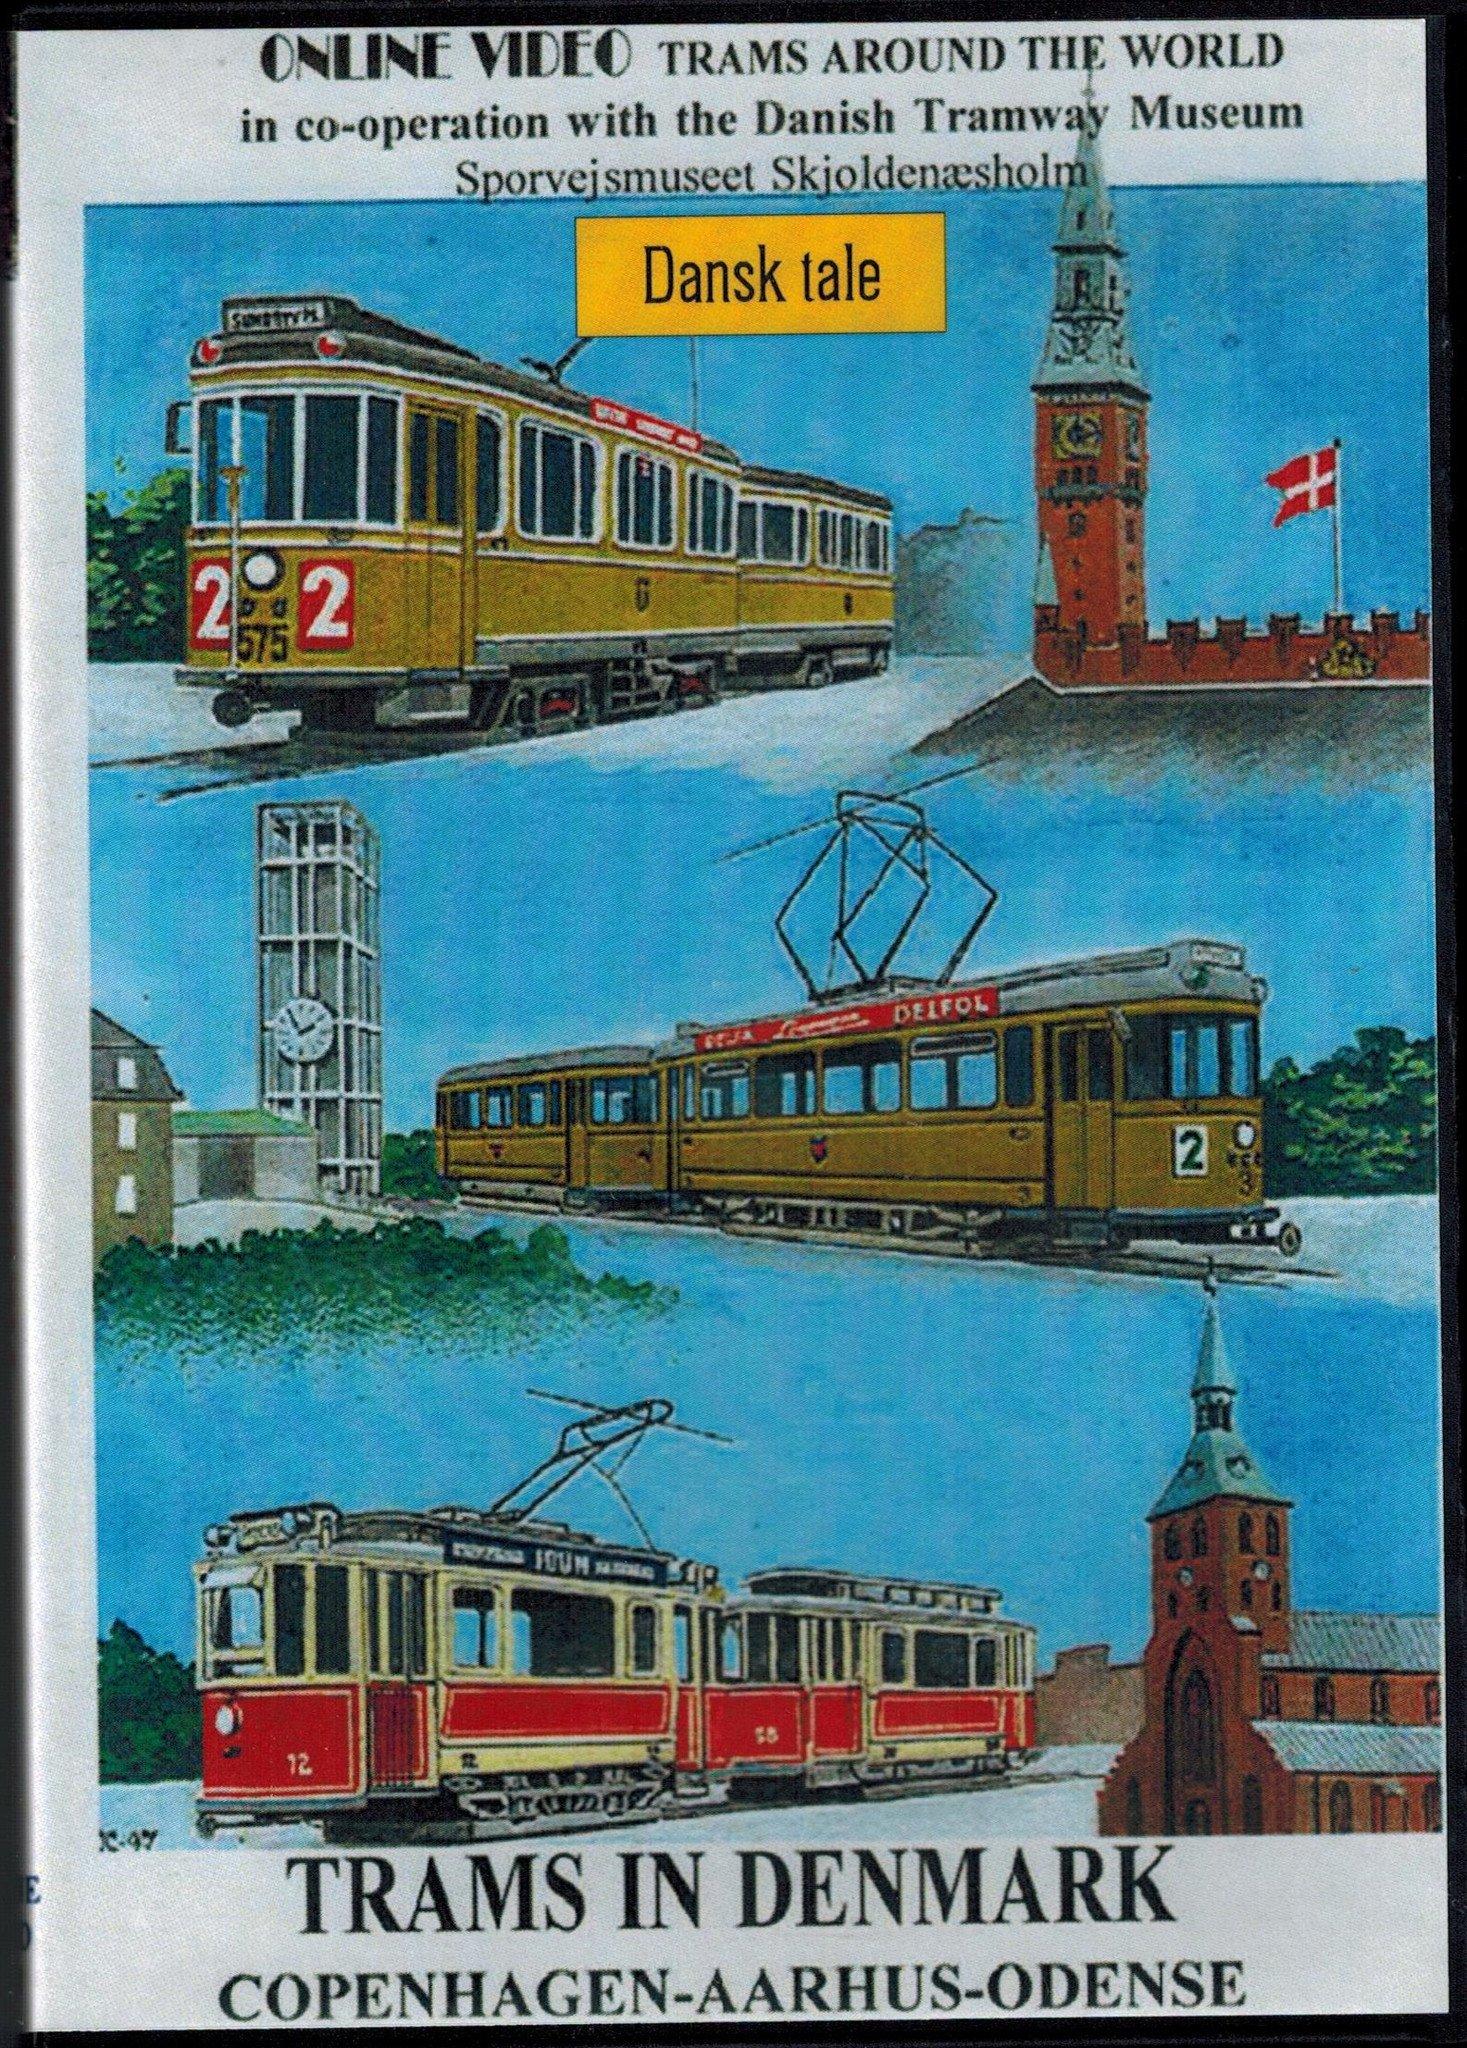 Sporvogne i Danmark/Trams in Denmark - Copenhagen - Aarhus - Odense